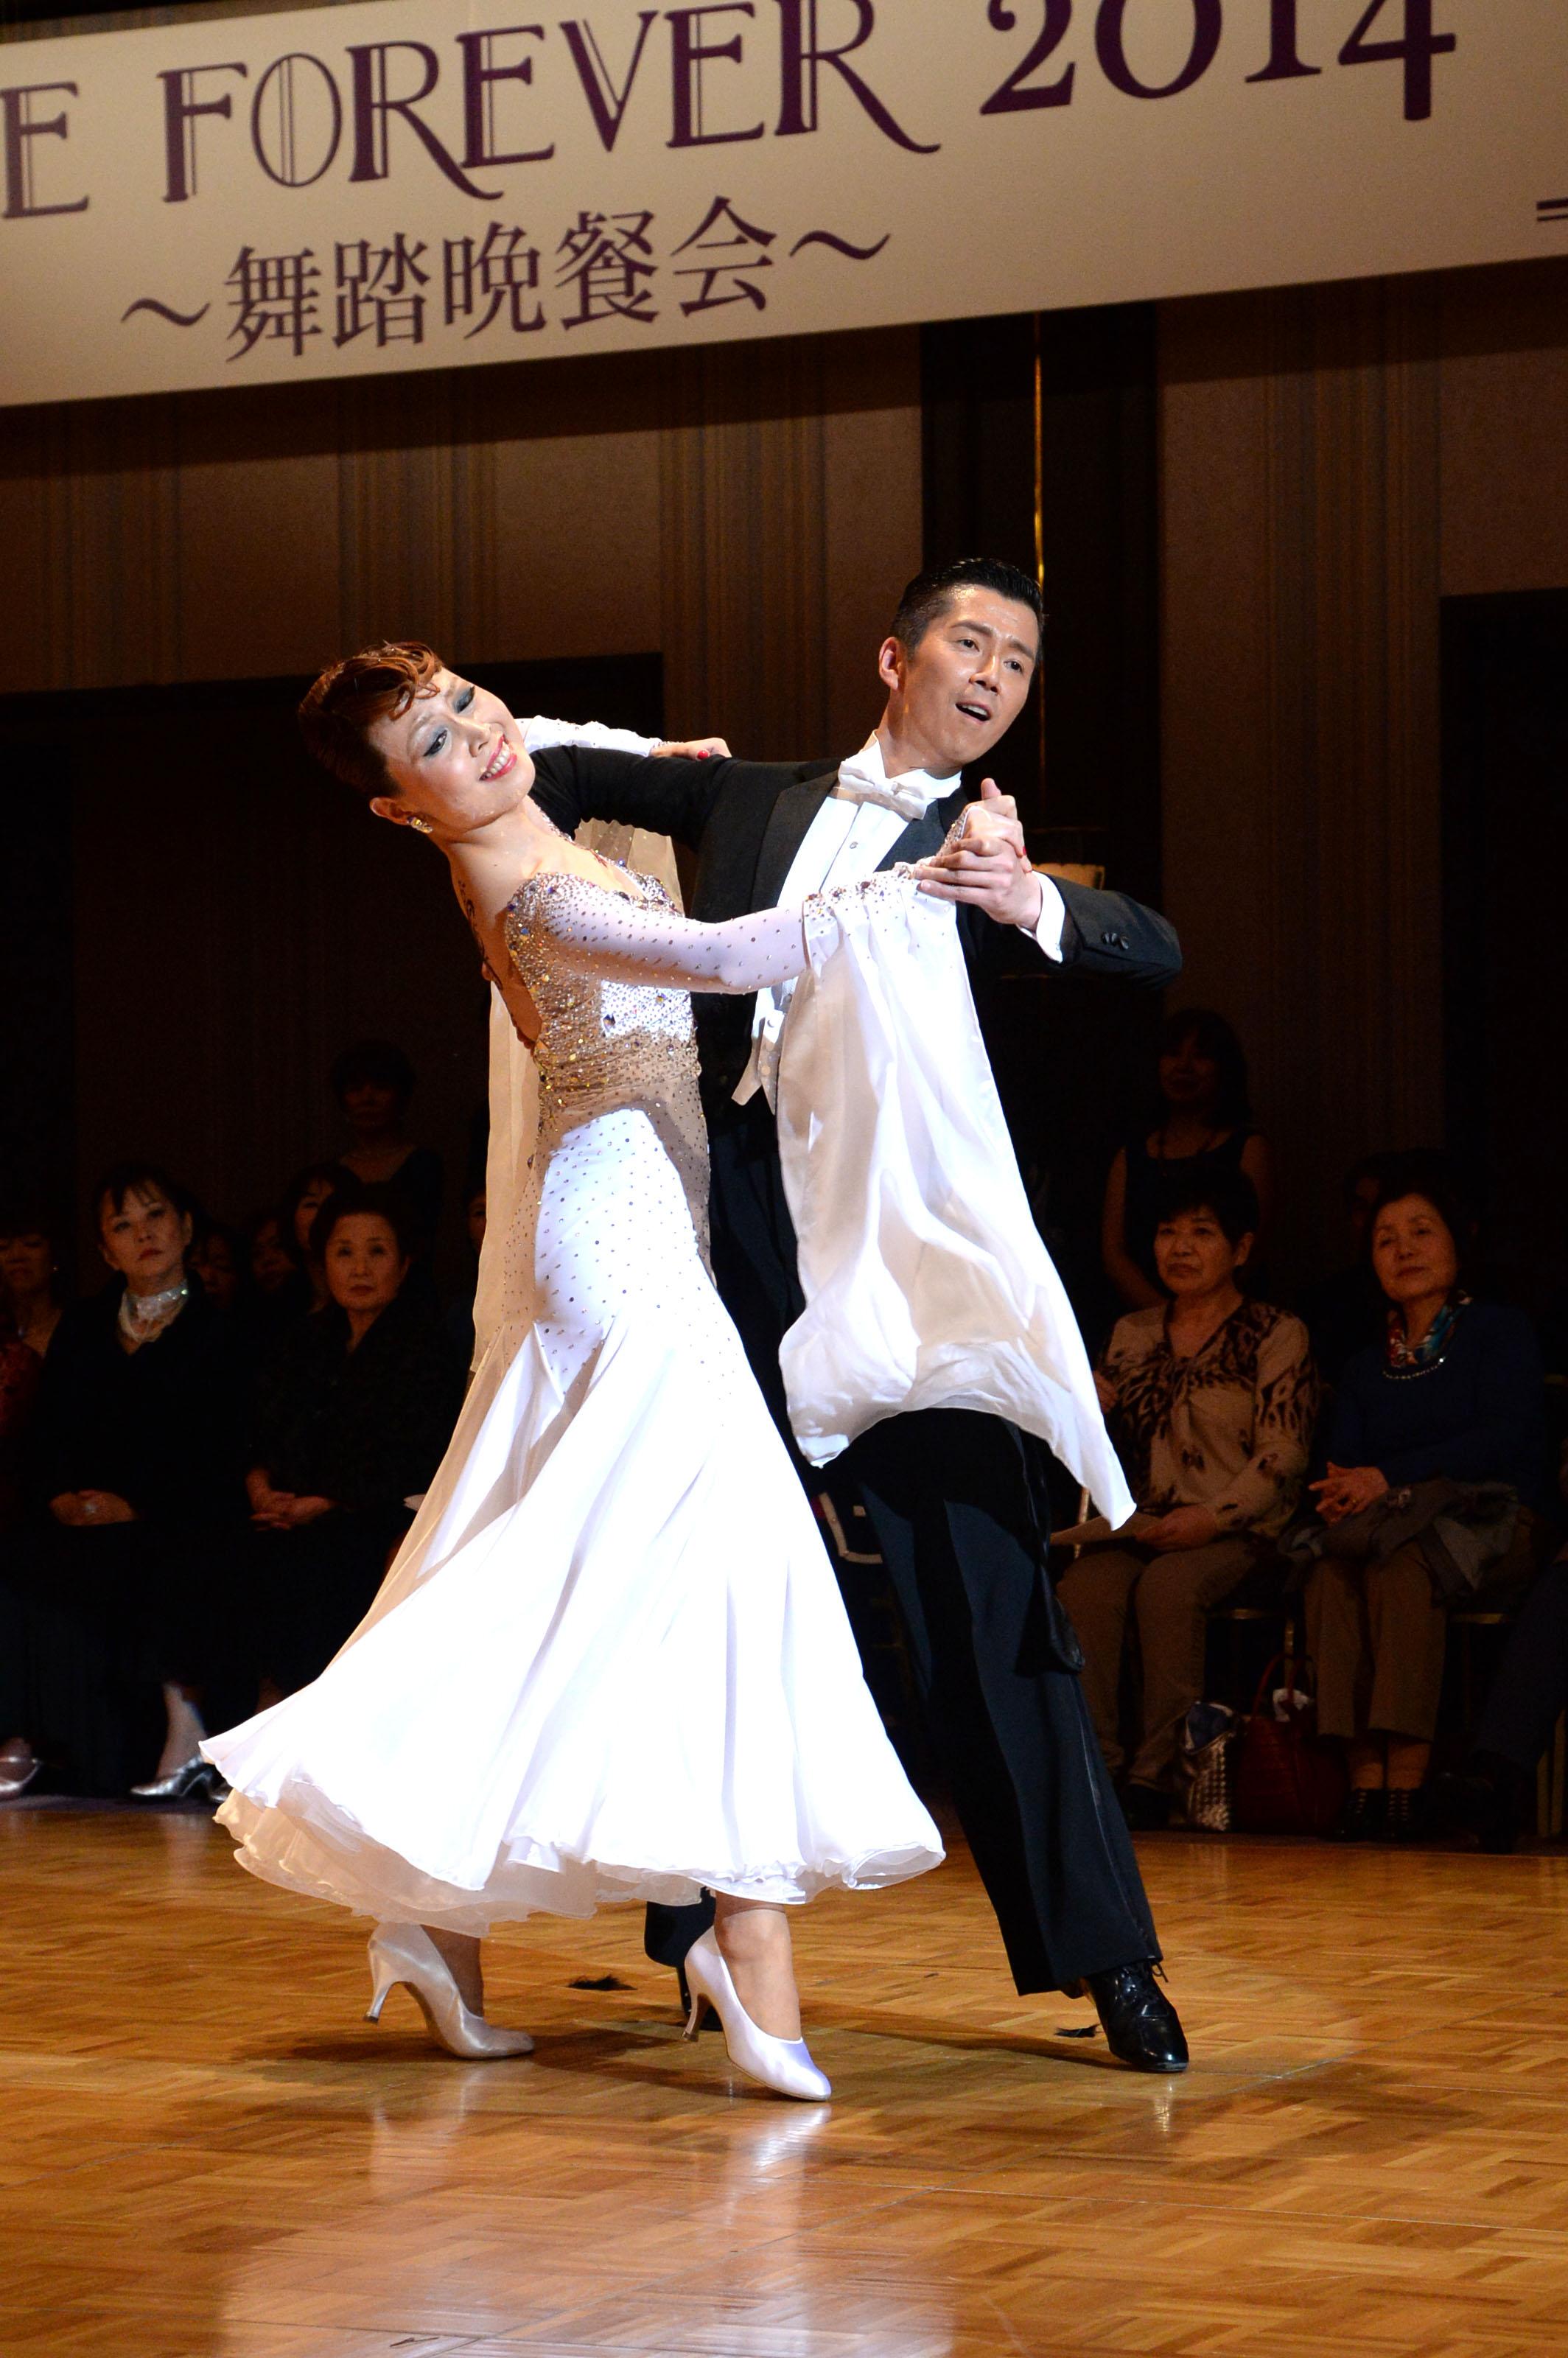 danceforever2014長崎 富田組白ドレス